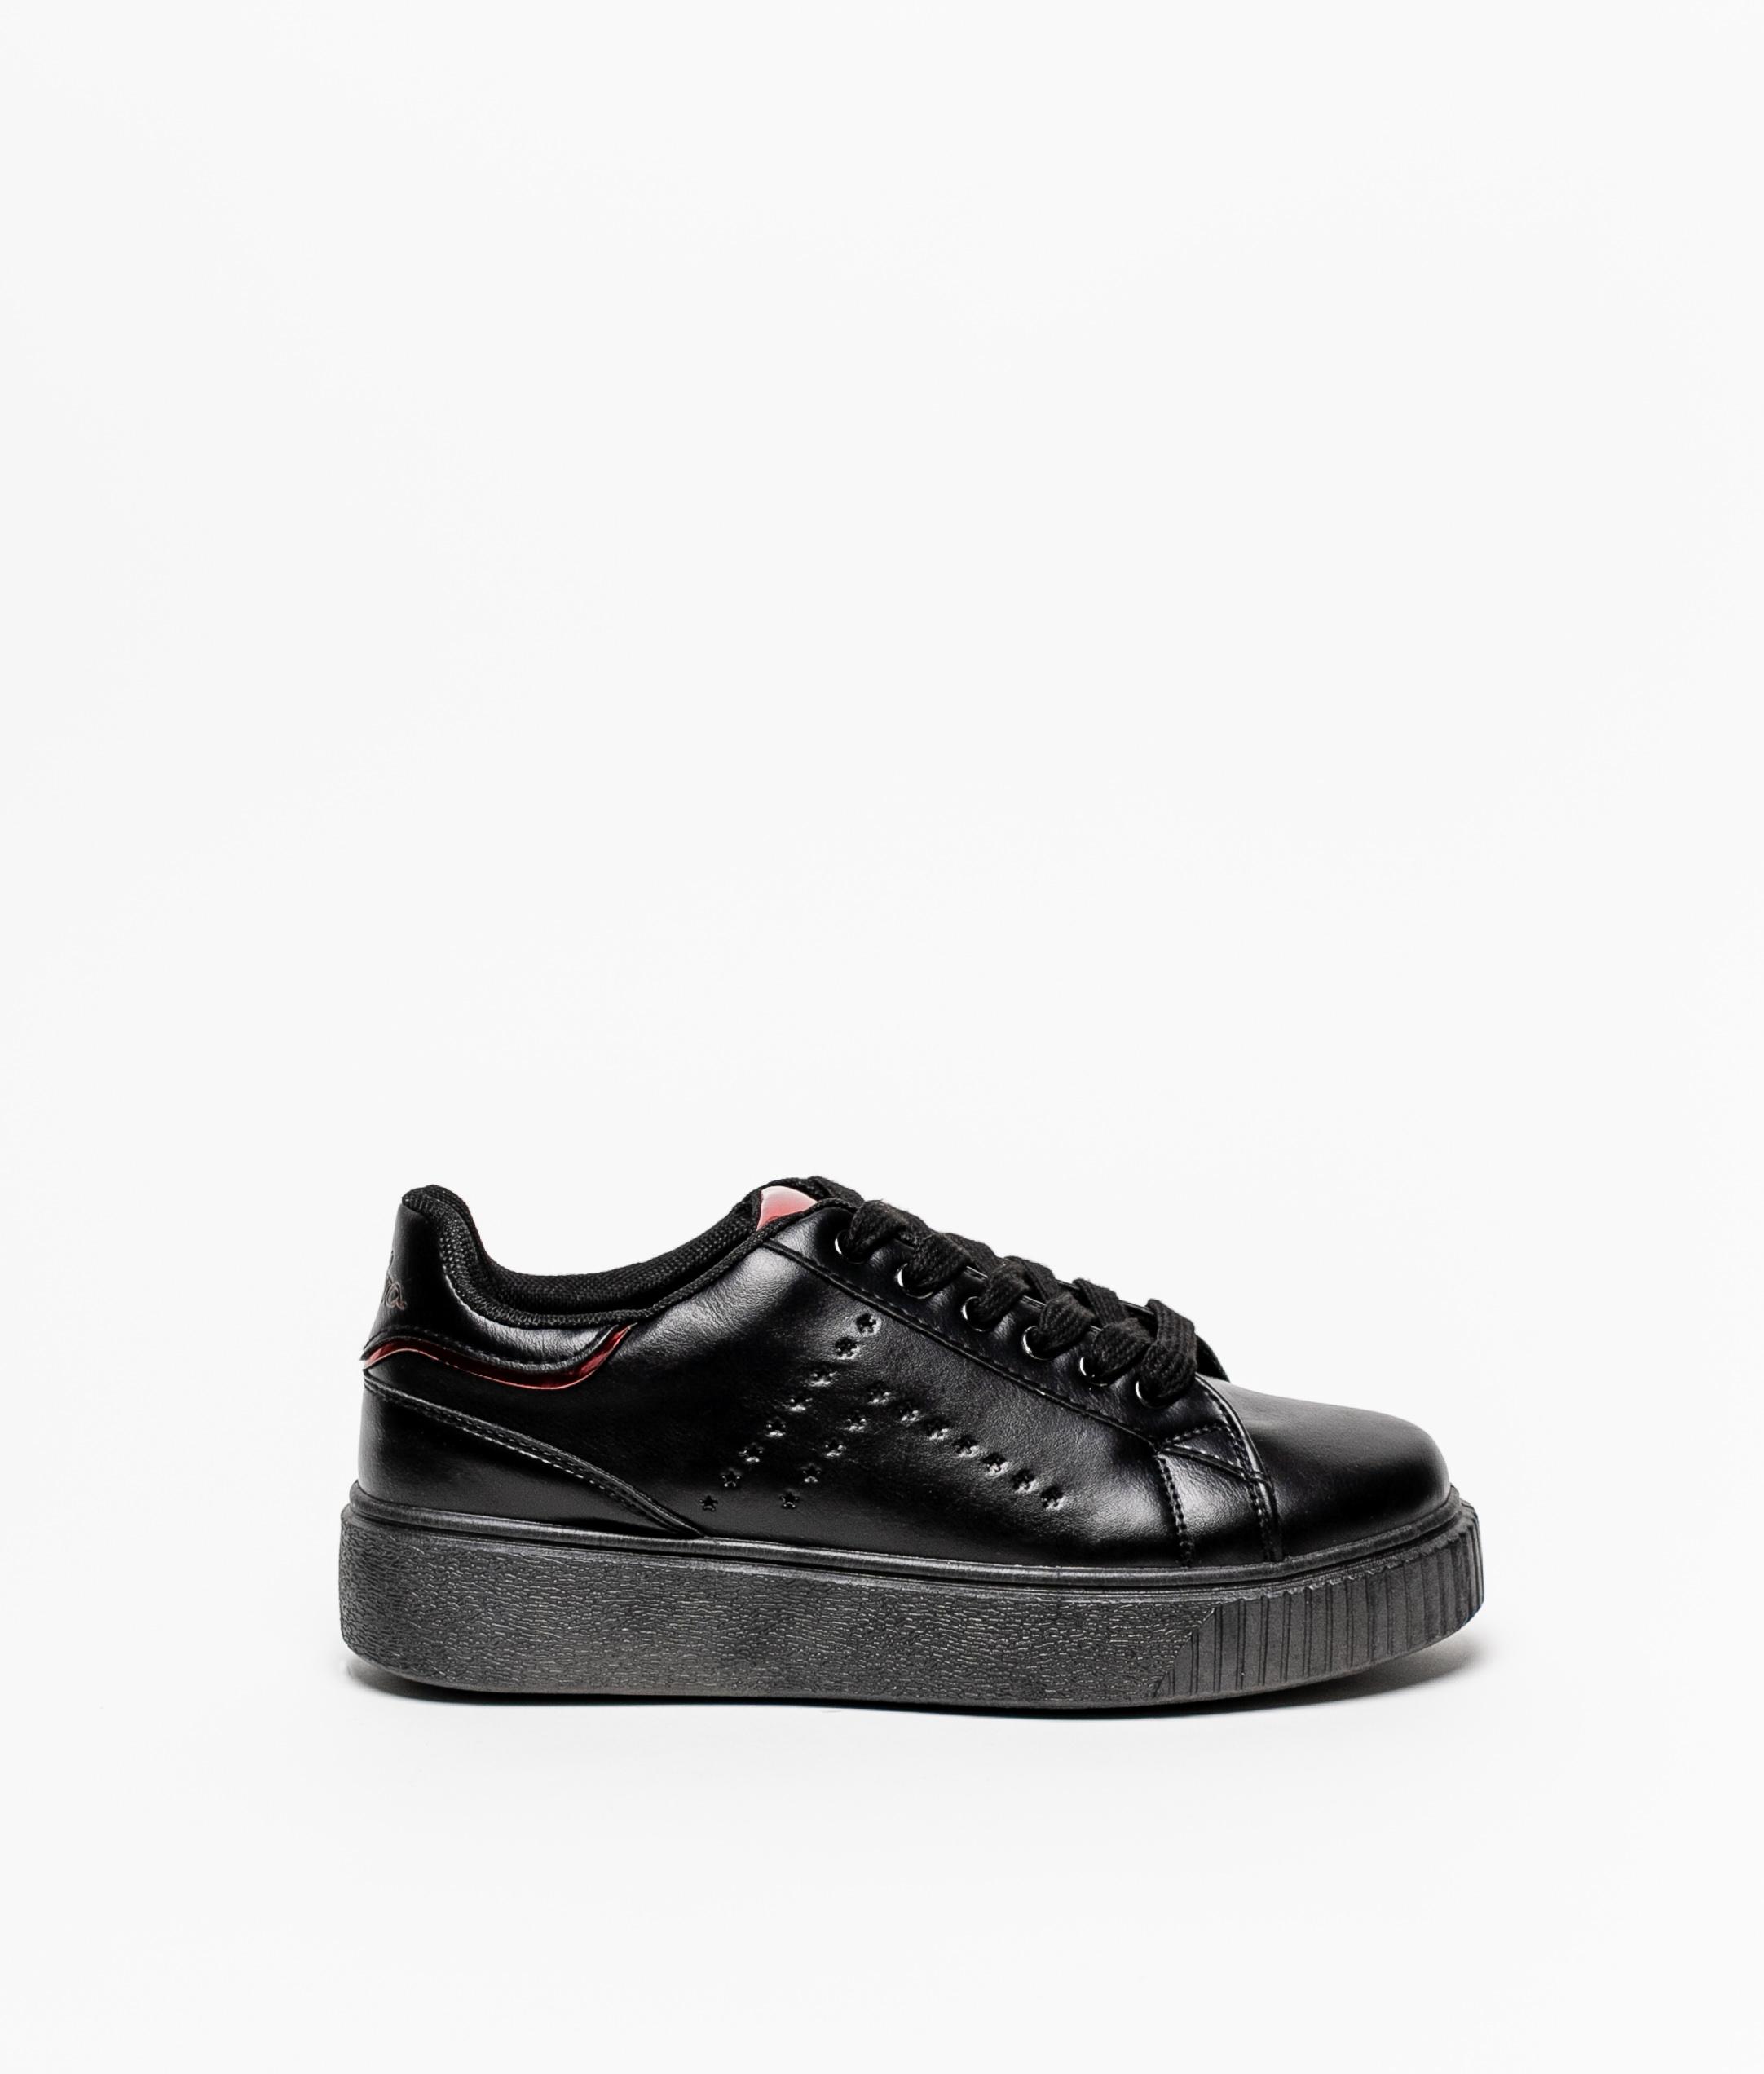 Sneakers Ruri - Black